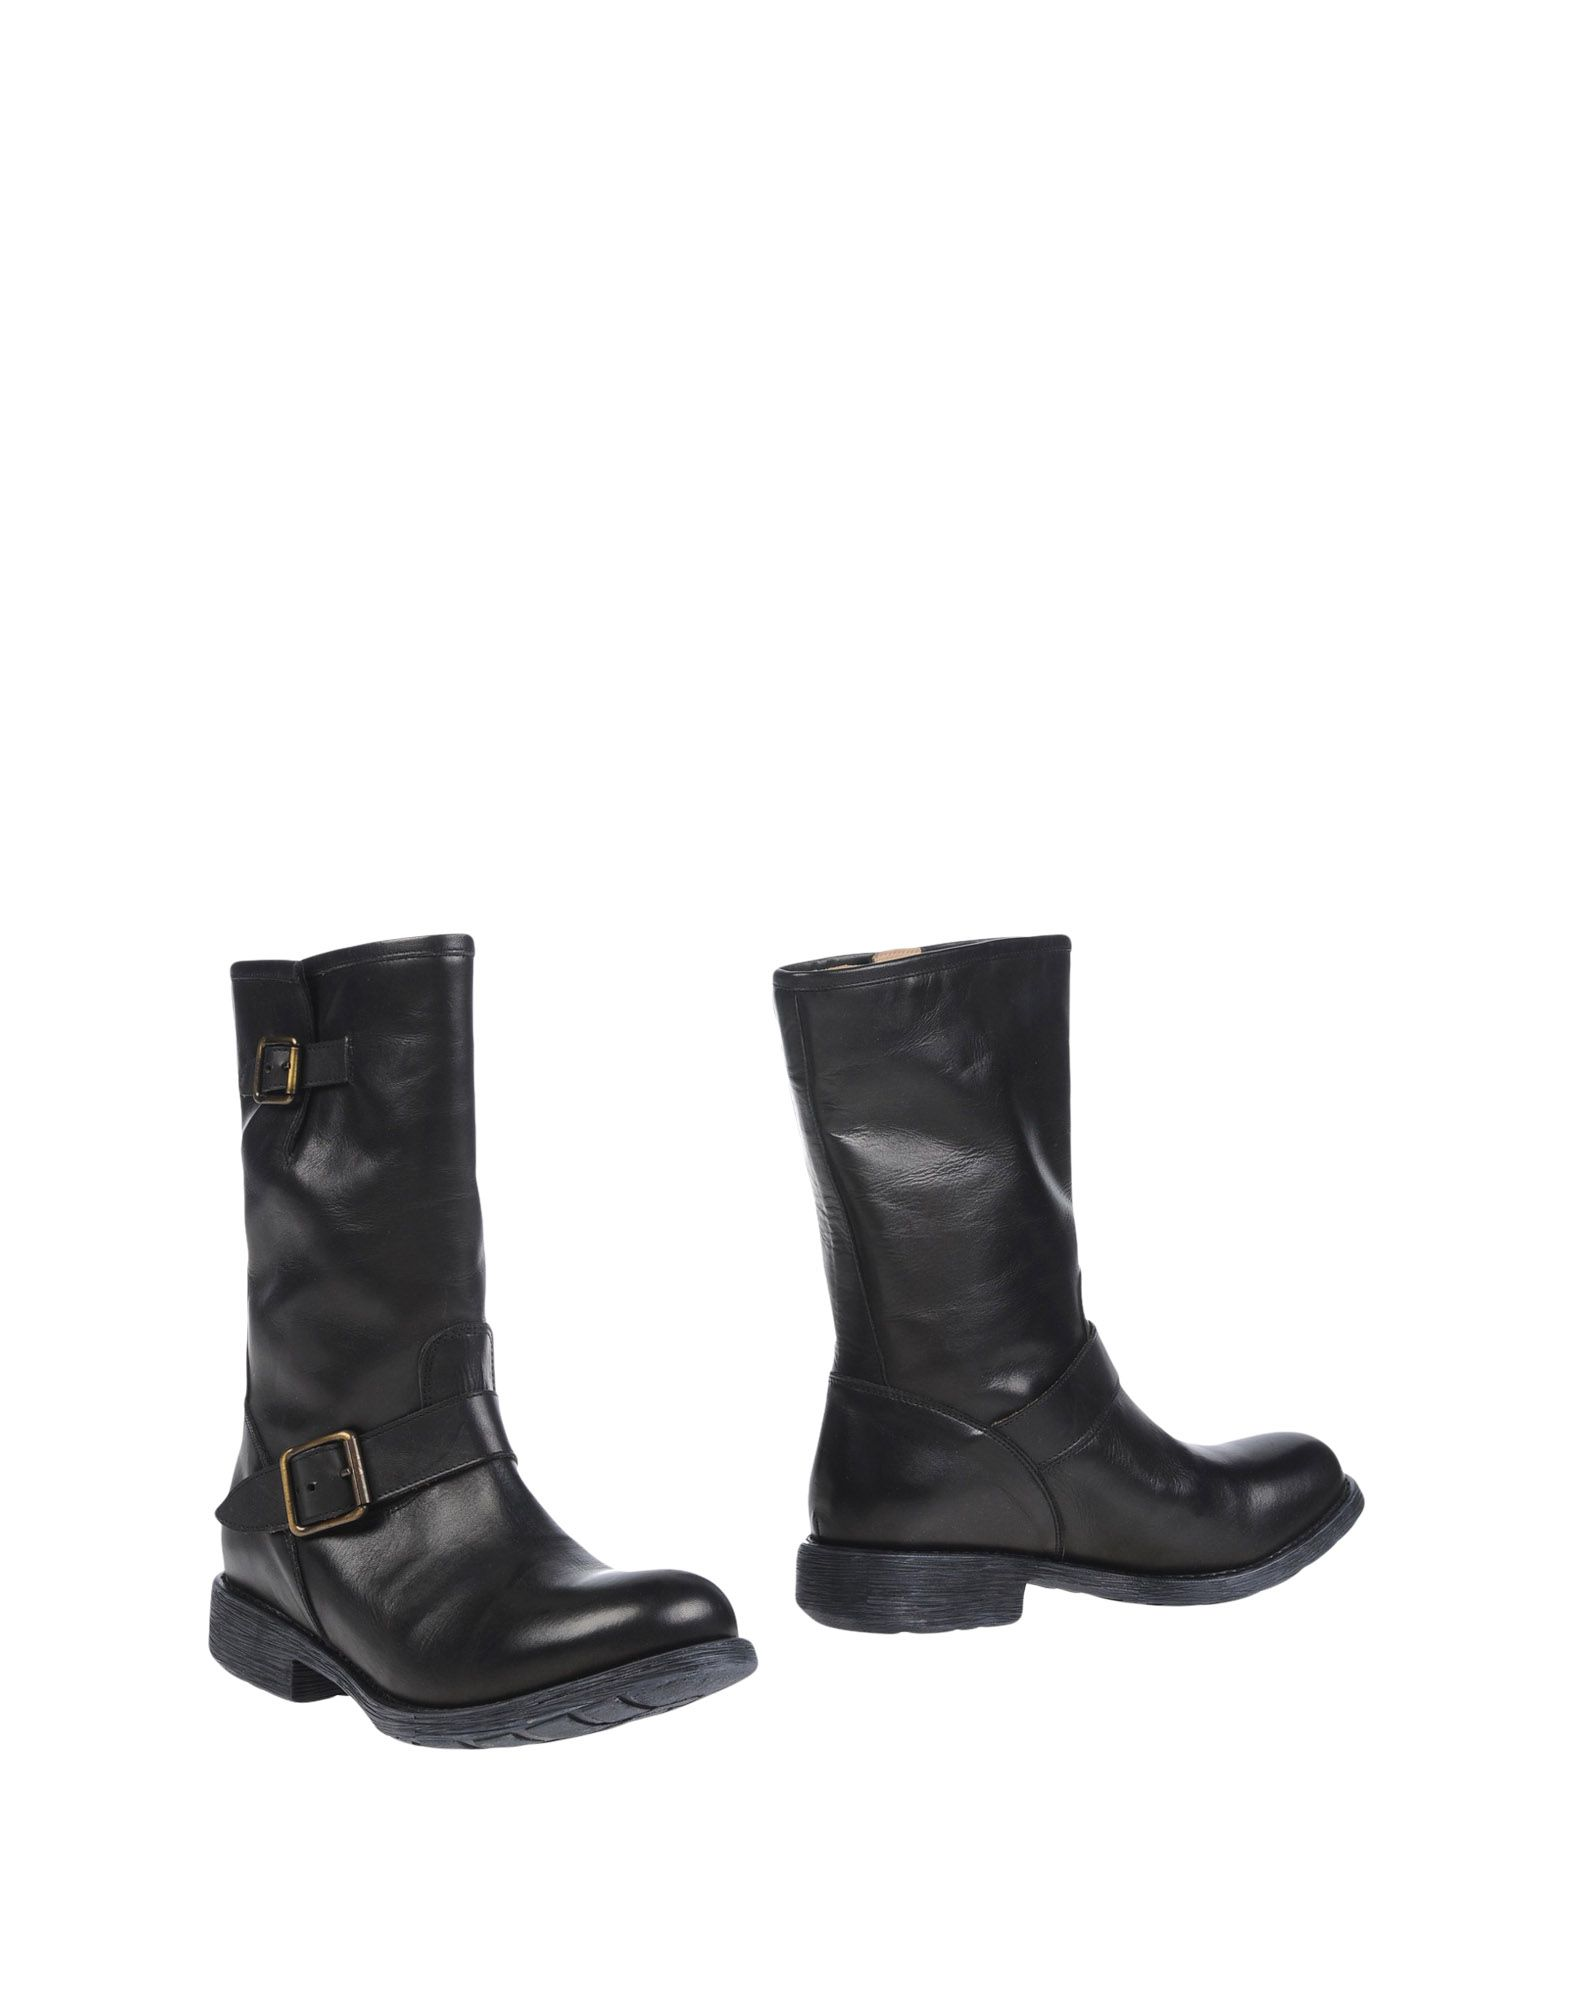 Regard Stiefelette Damen  Schuhe 11191372DI Gute Qualität beliebte Schuhe  eecc93